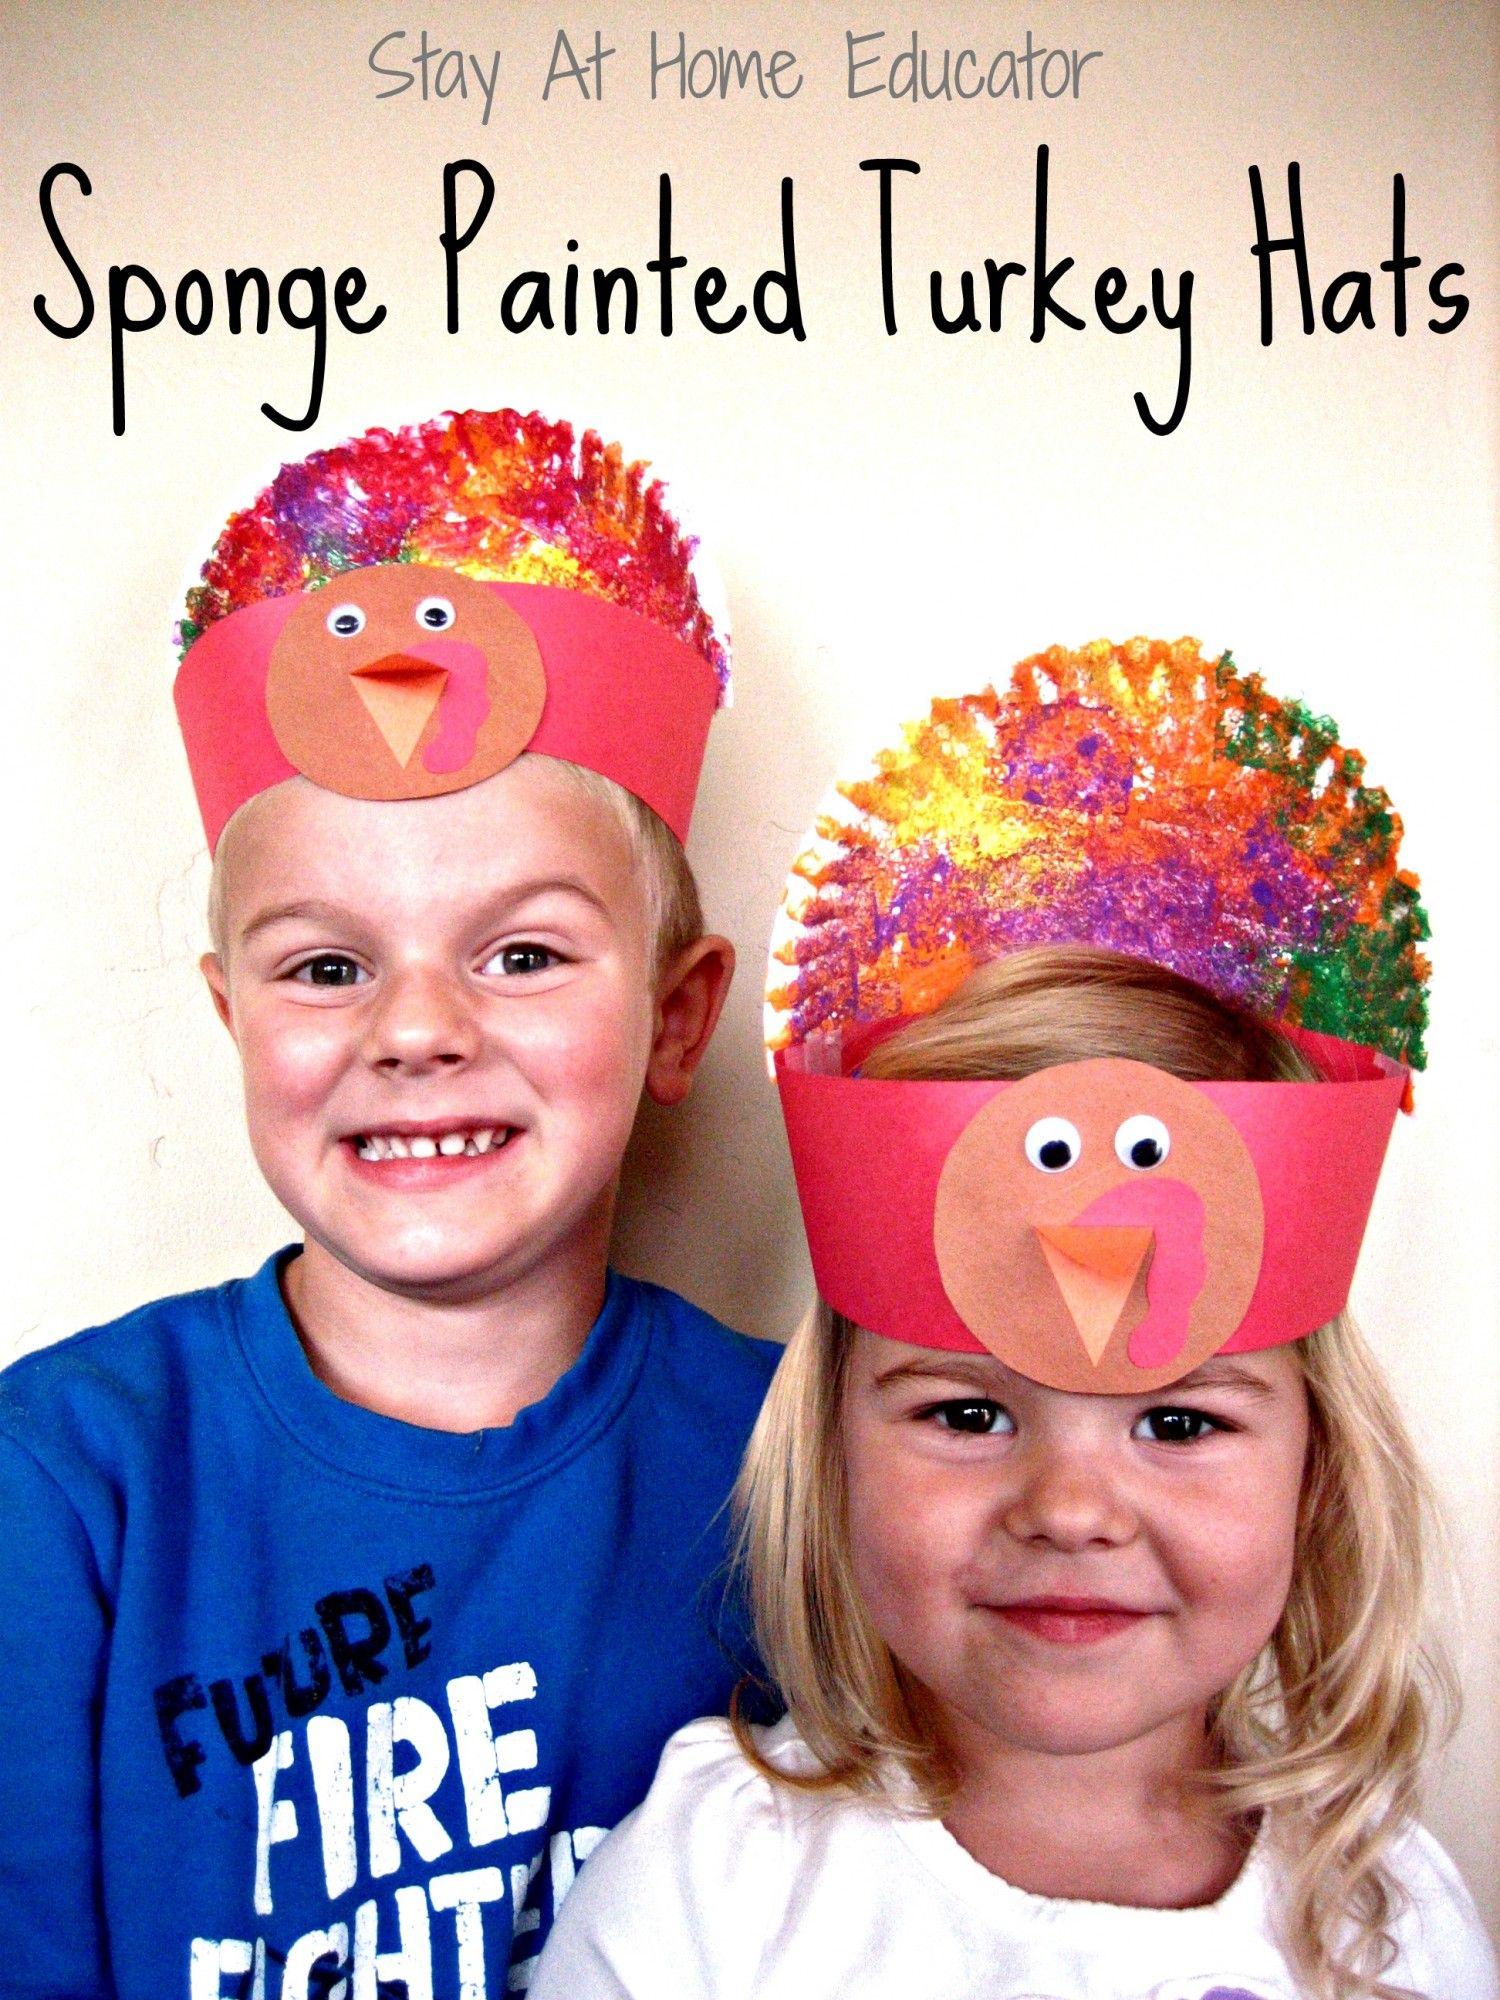 Sponge Painted Turkey Hats